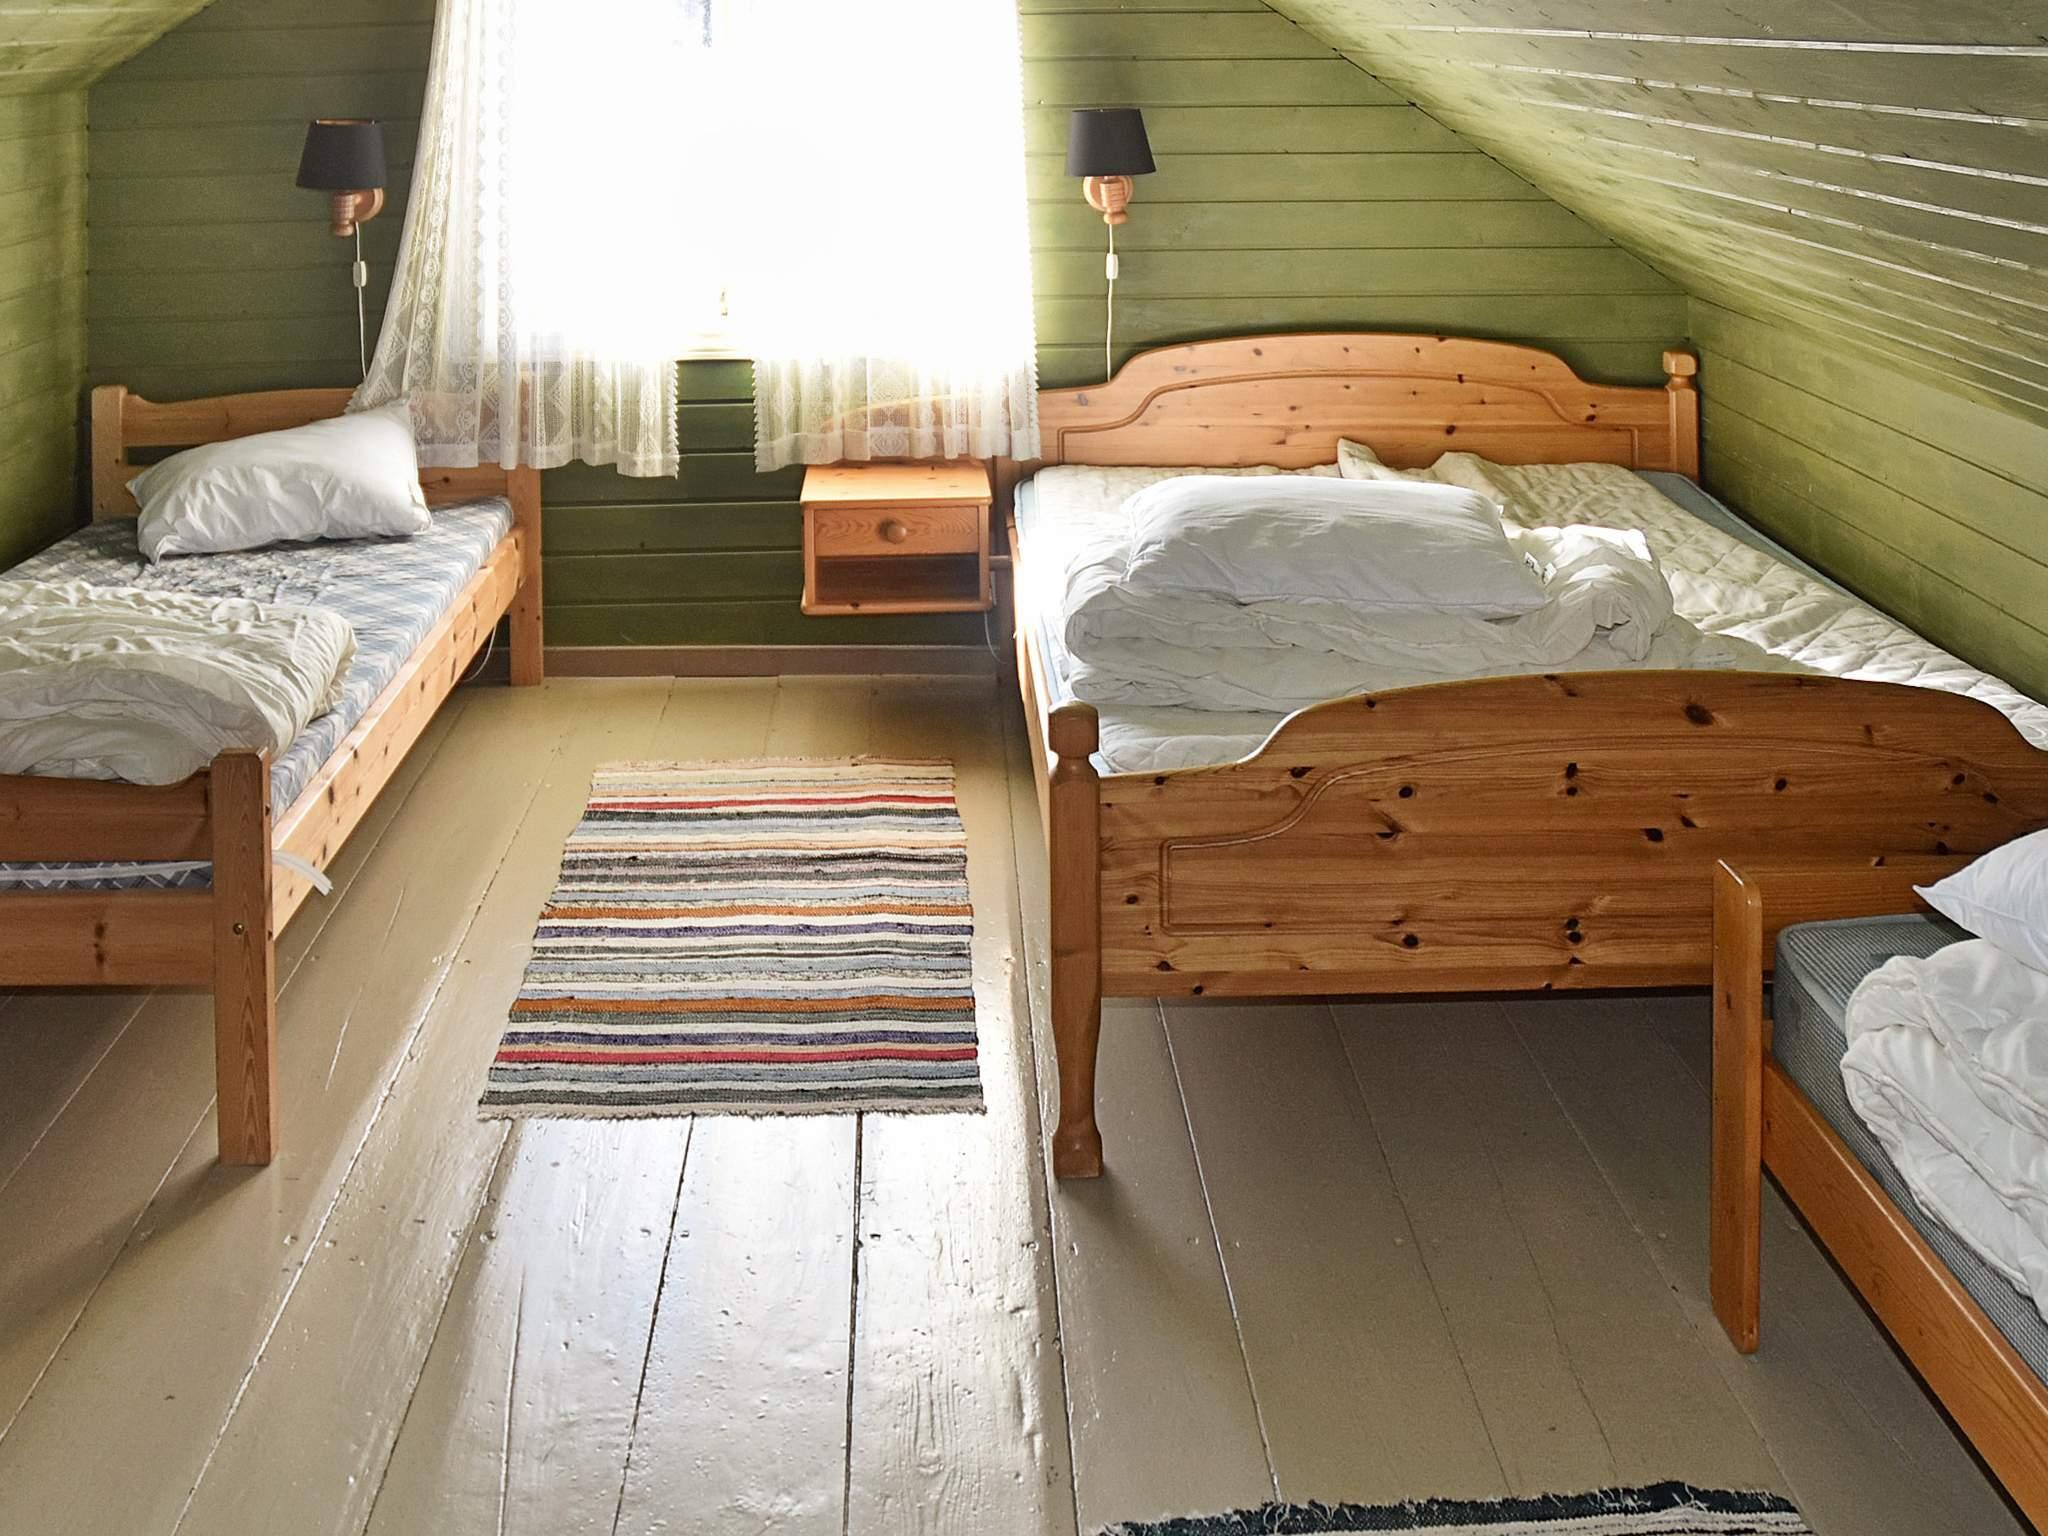 Ferienhaus Etne (83639), Etne, Hordaland - Hardangerfjord, Westnorwegen, Norwegen, Bild 10